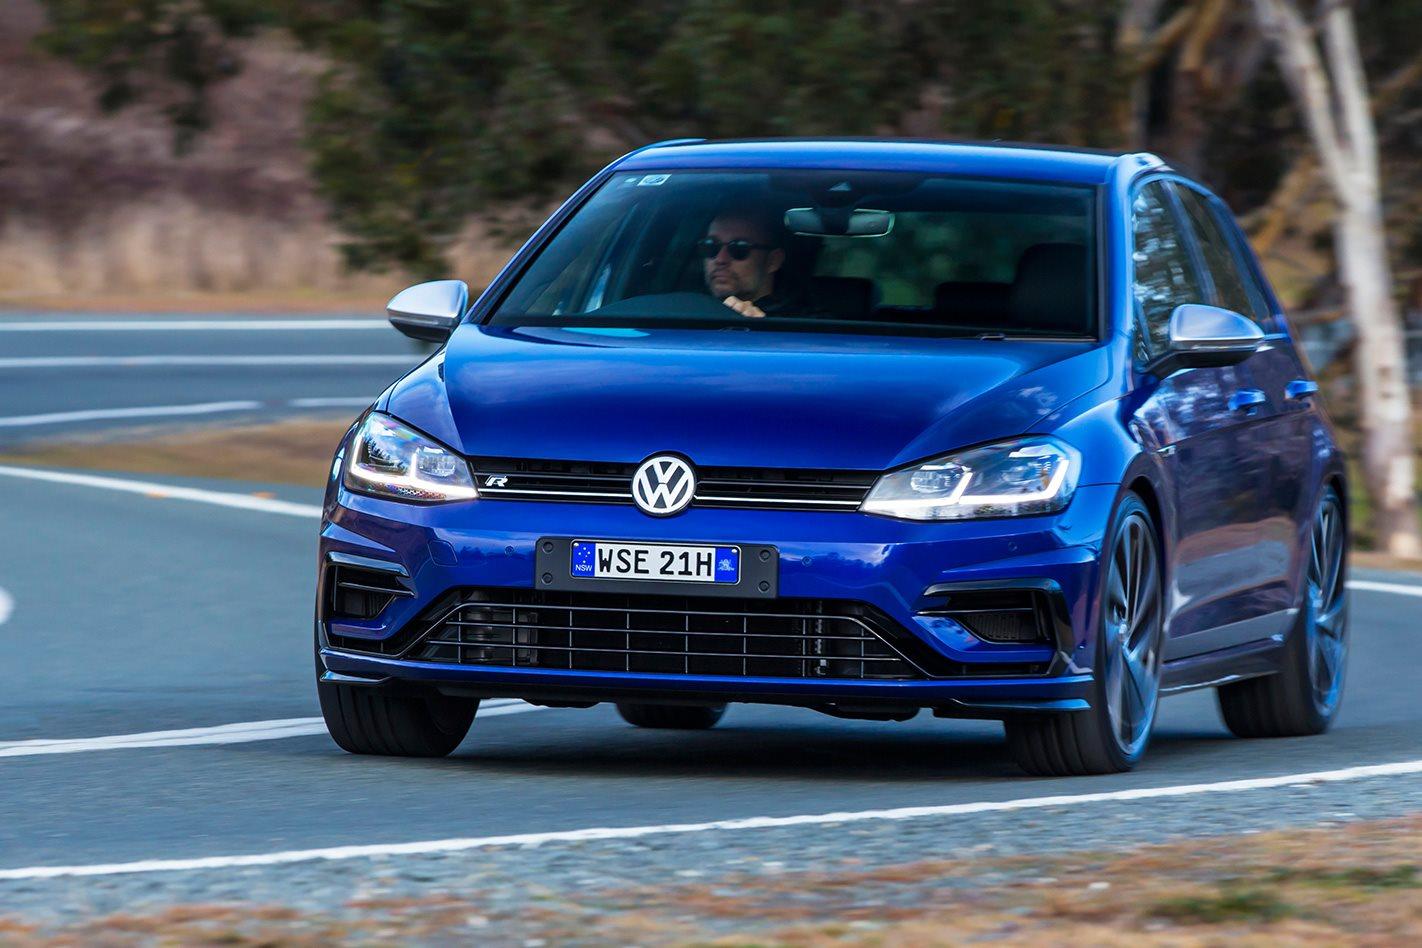 2018-Volkswagen-Golf-R-7.5.jpg